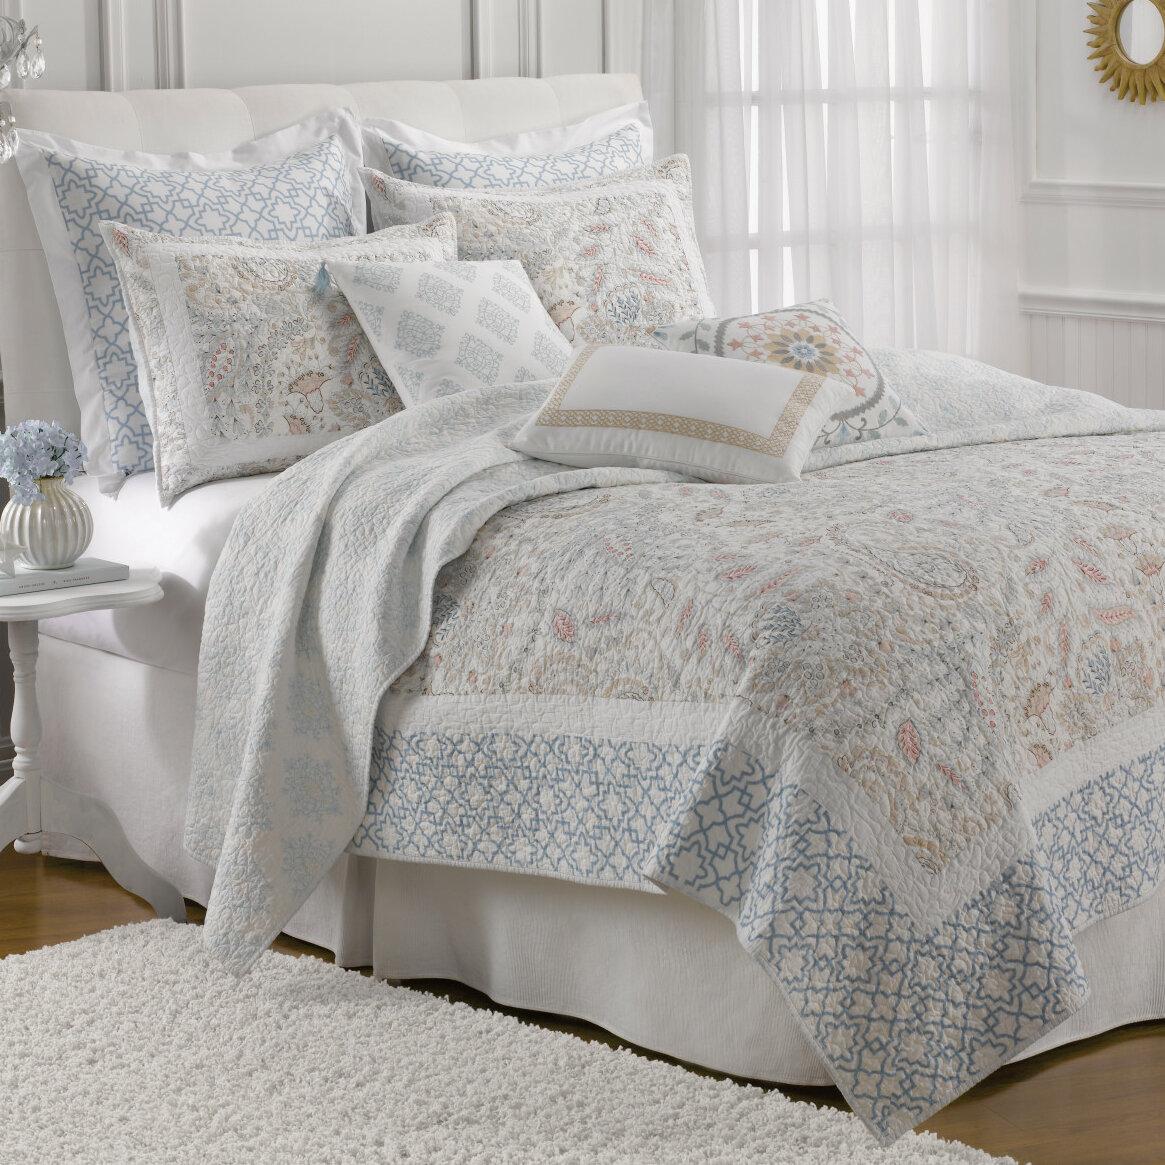 Dena Designs Sophia Quilt & Reviews | Wayfair : dena home sunbeam quilt - Adamdwight.com